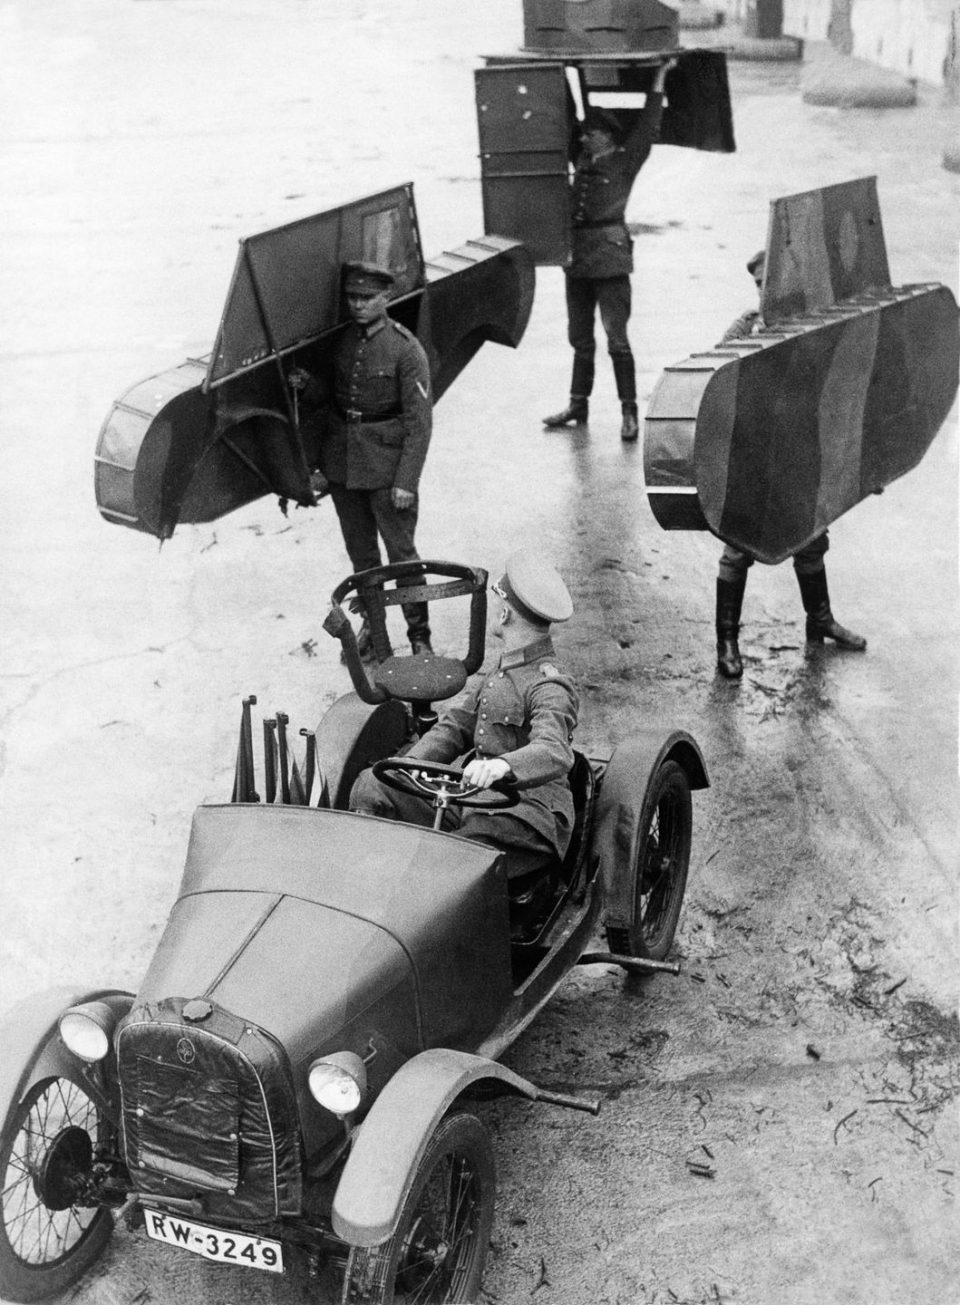 1931г. Немецкие солдаты несут каркас макета танка, который должен быть присоединен к машине.